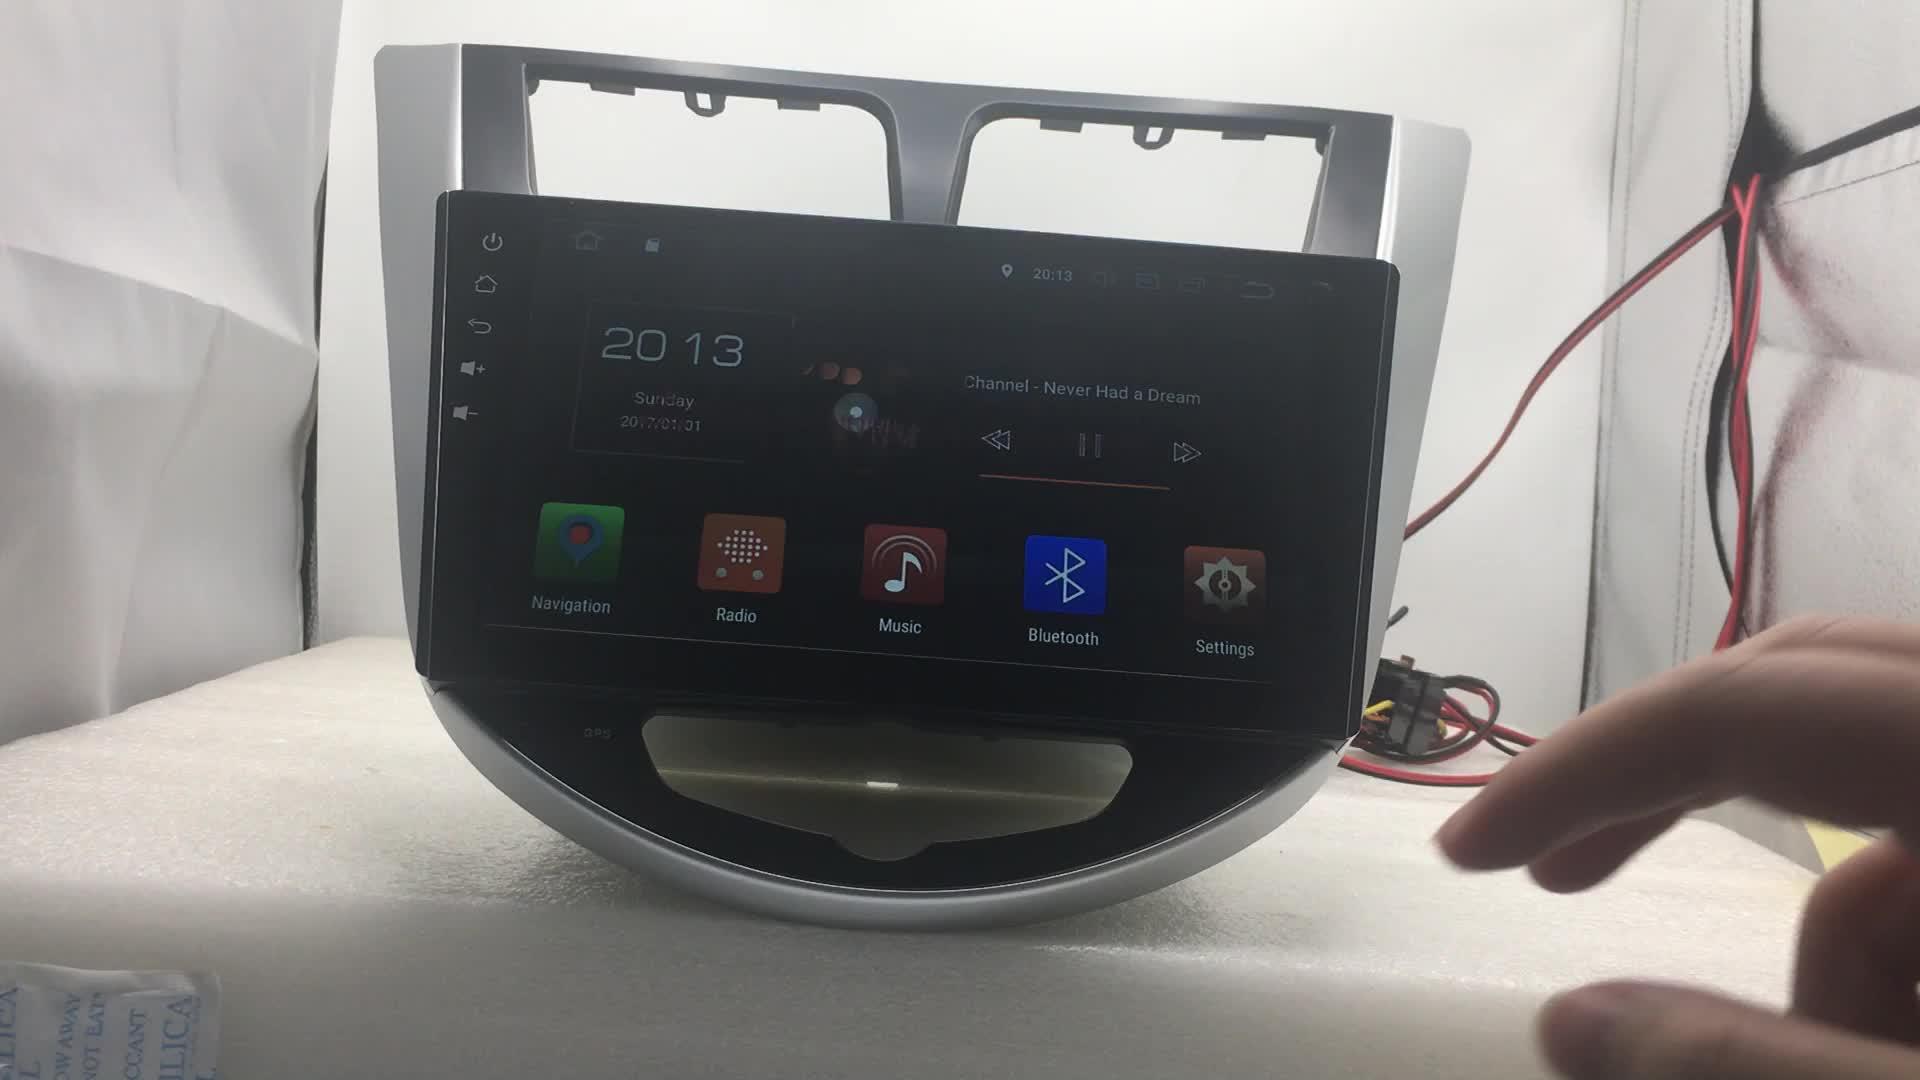 10.1 pollici car multimedia android 8.0 per Toyota Camry 2012-2014 sistema di navigazione gps